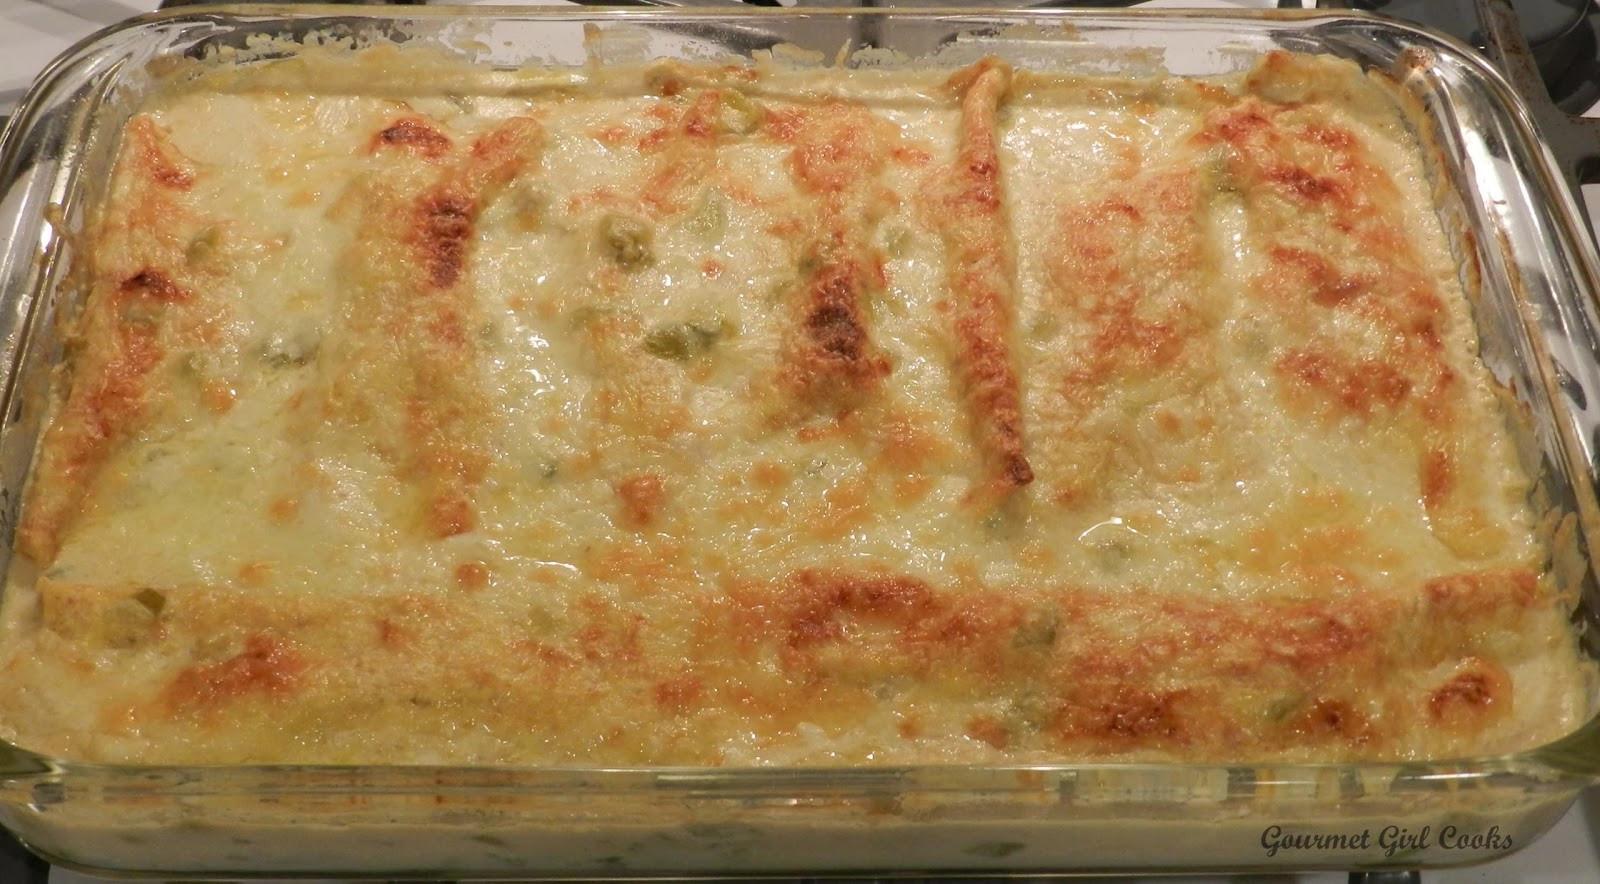 Chicken Enchilada Casserole  Gourmet Girl Cooks White Chicken Enchilada Casserole